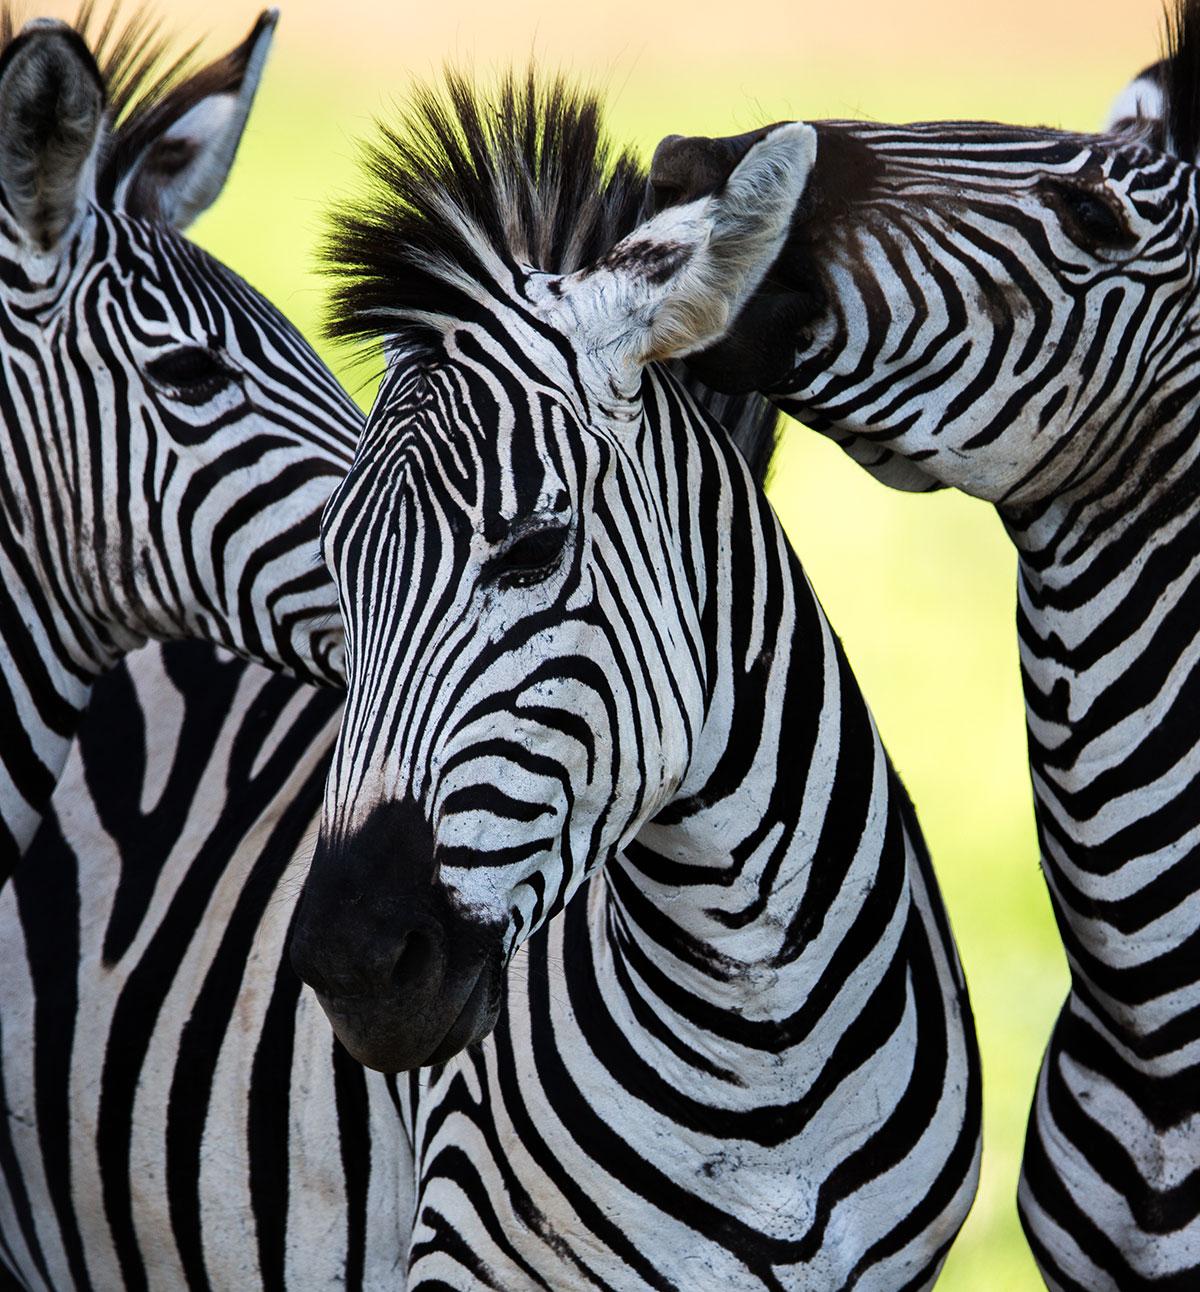 B4School FUN - Alphabet Adventure - Z is for Zebra